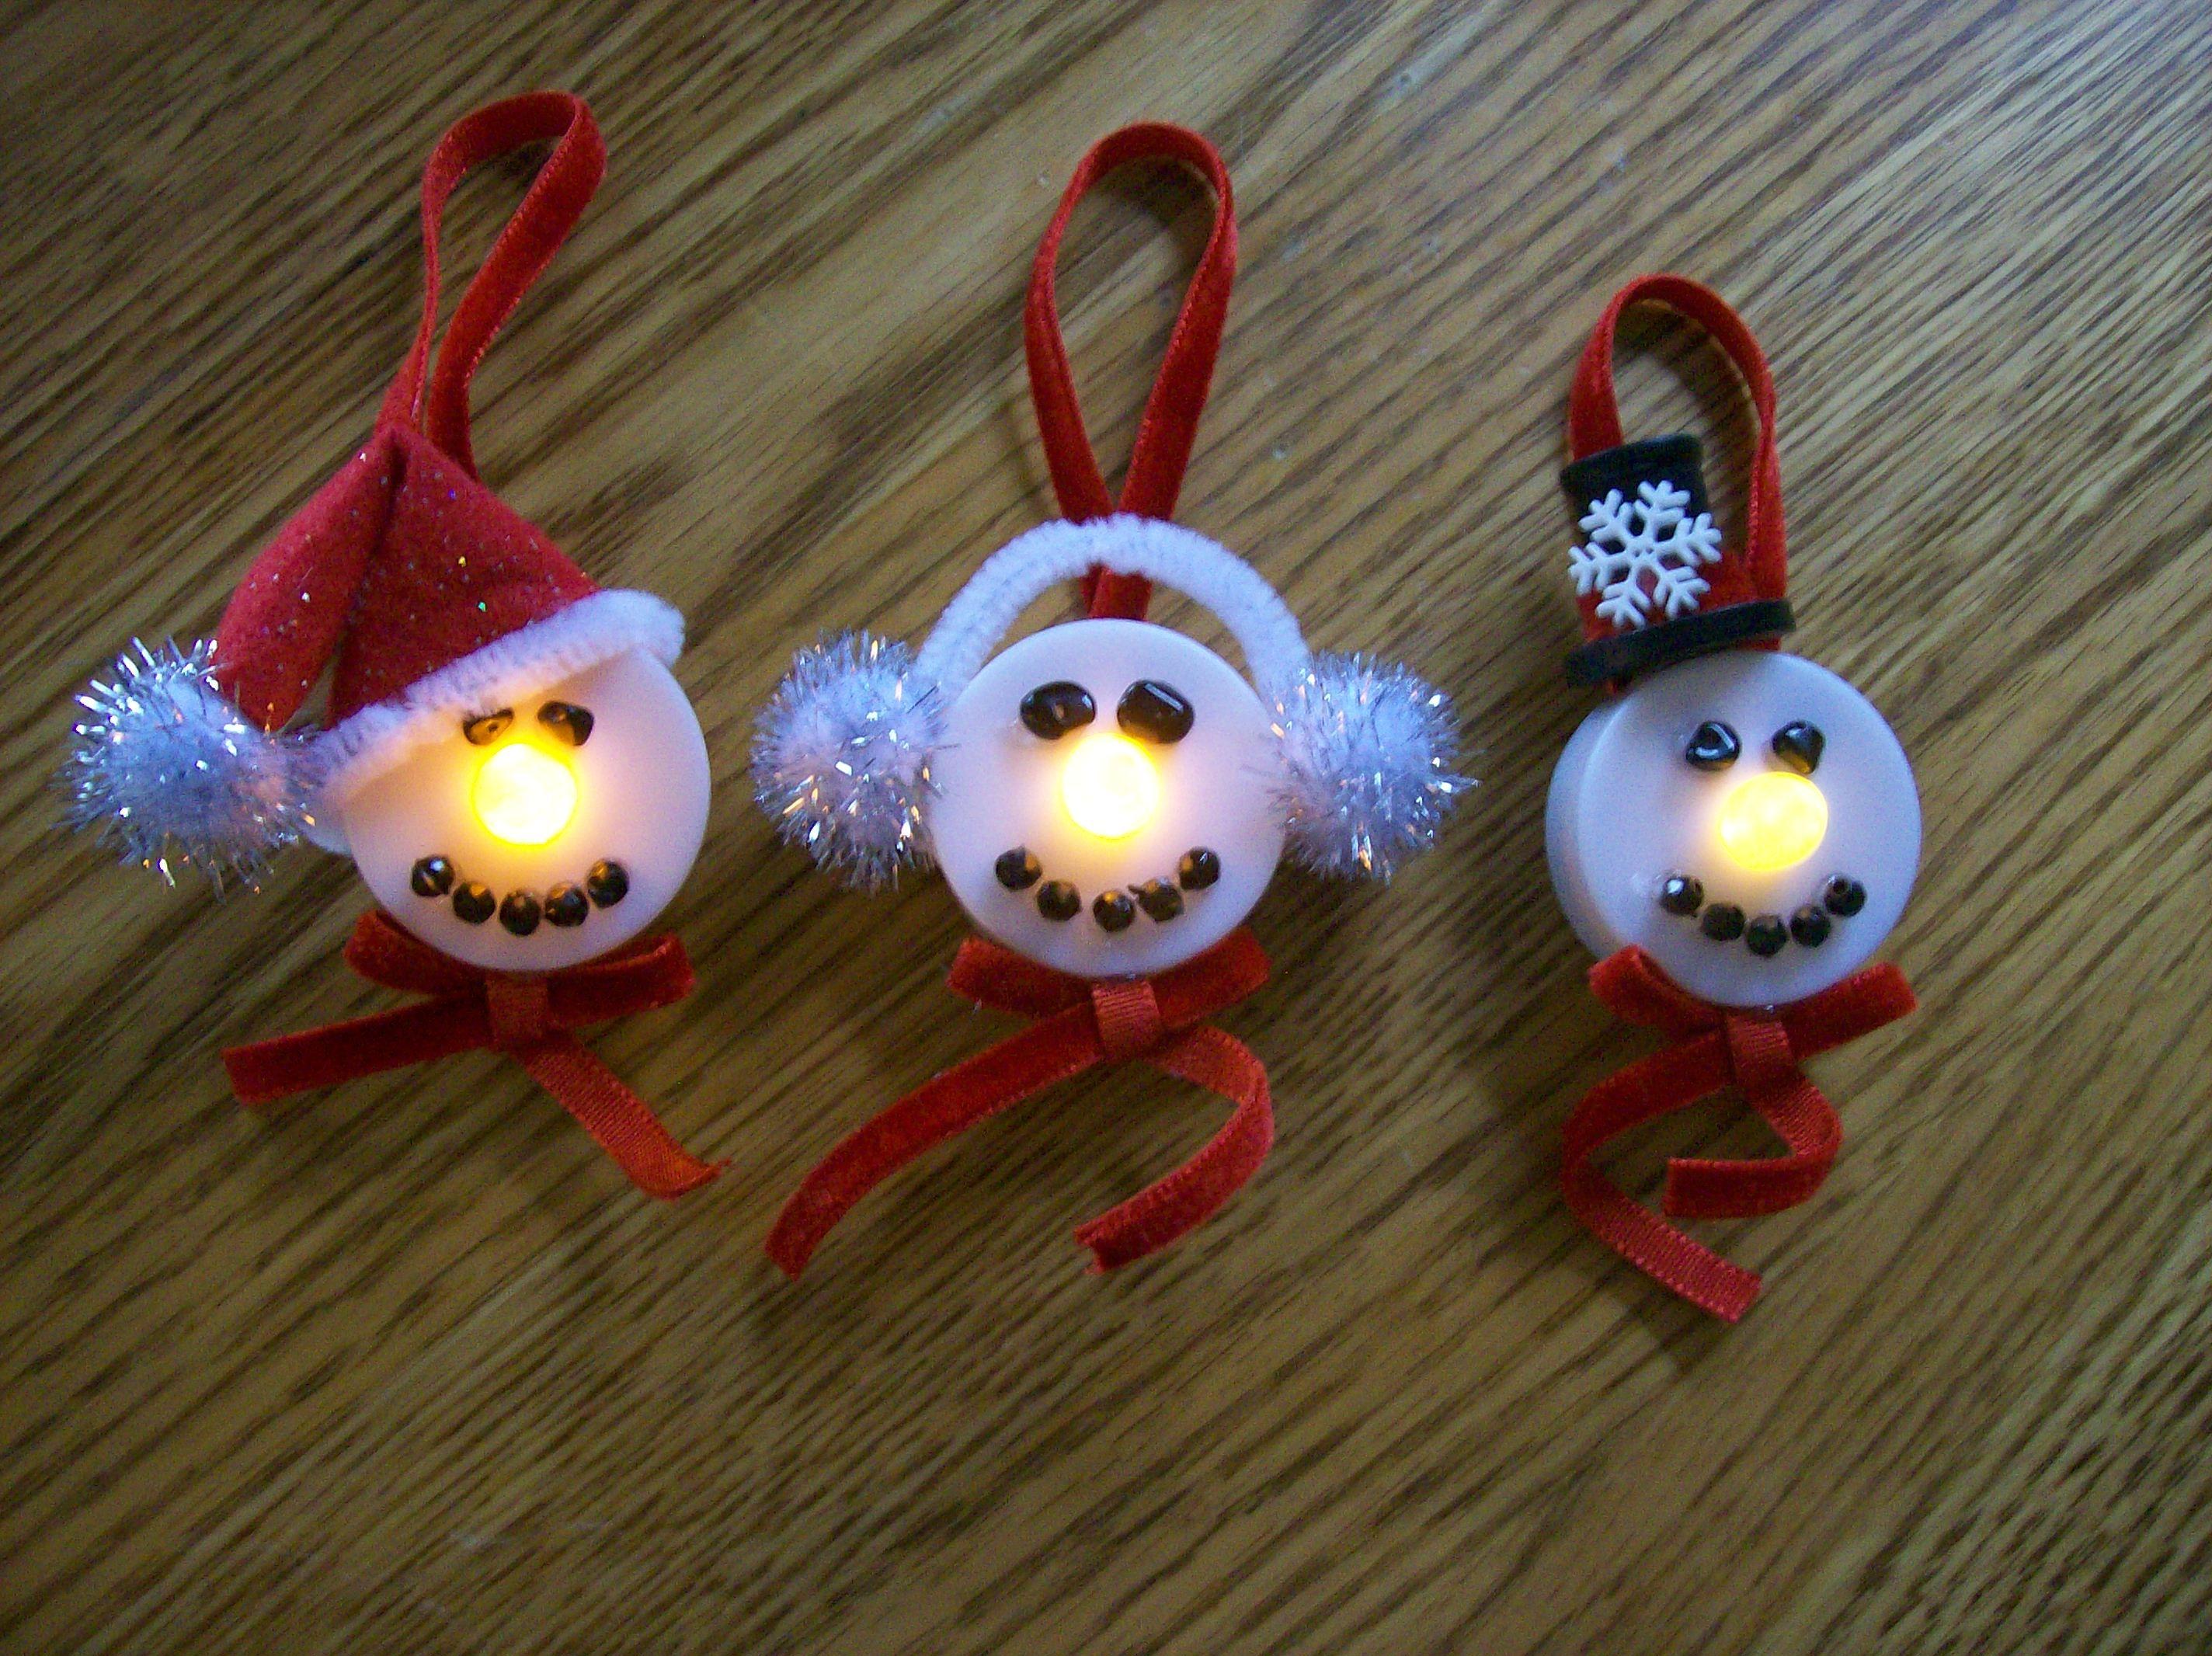 Tea Light Snowman Ornaments Christmas Candle Crafts Tea Light Crafts Tea Lights Christmas